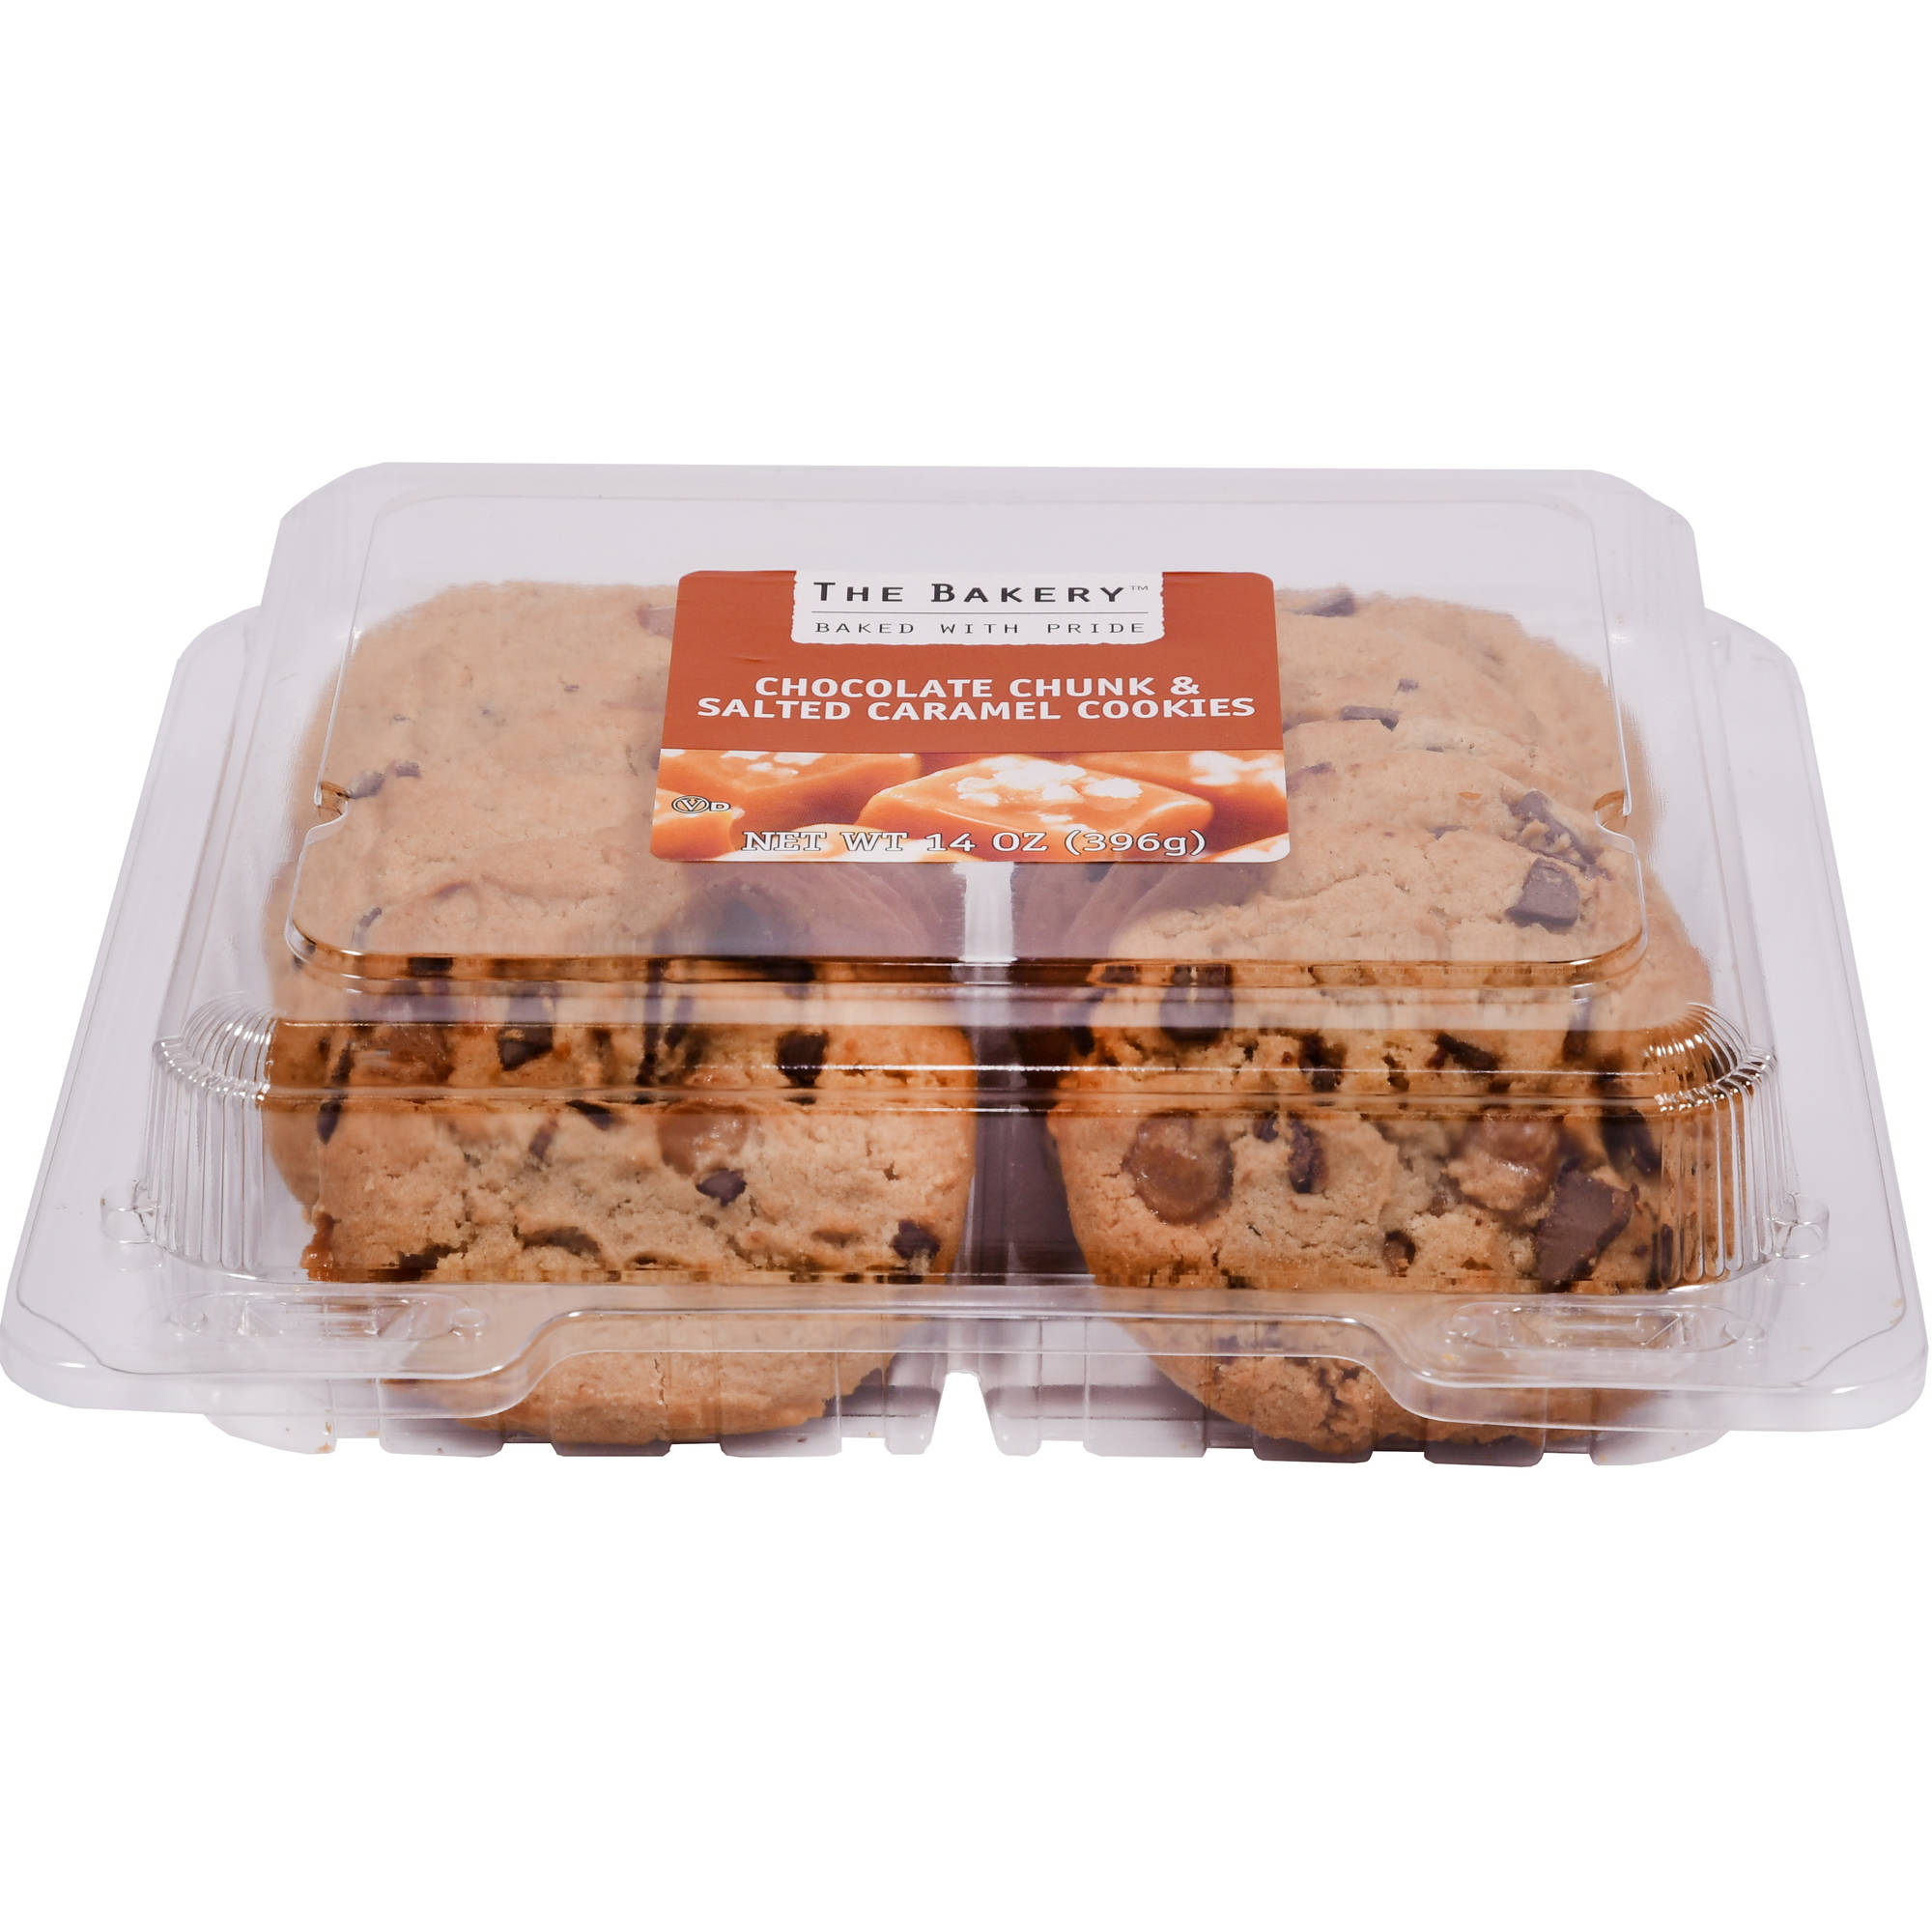 Wal-mart Bakery Chocolate Chunk Salted Caramel Cookies